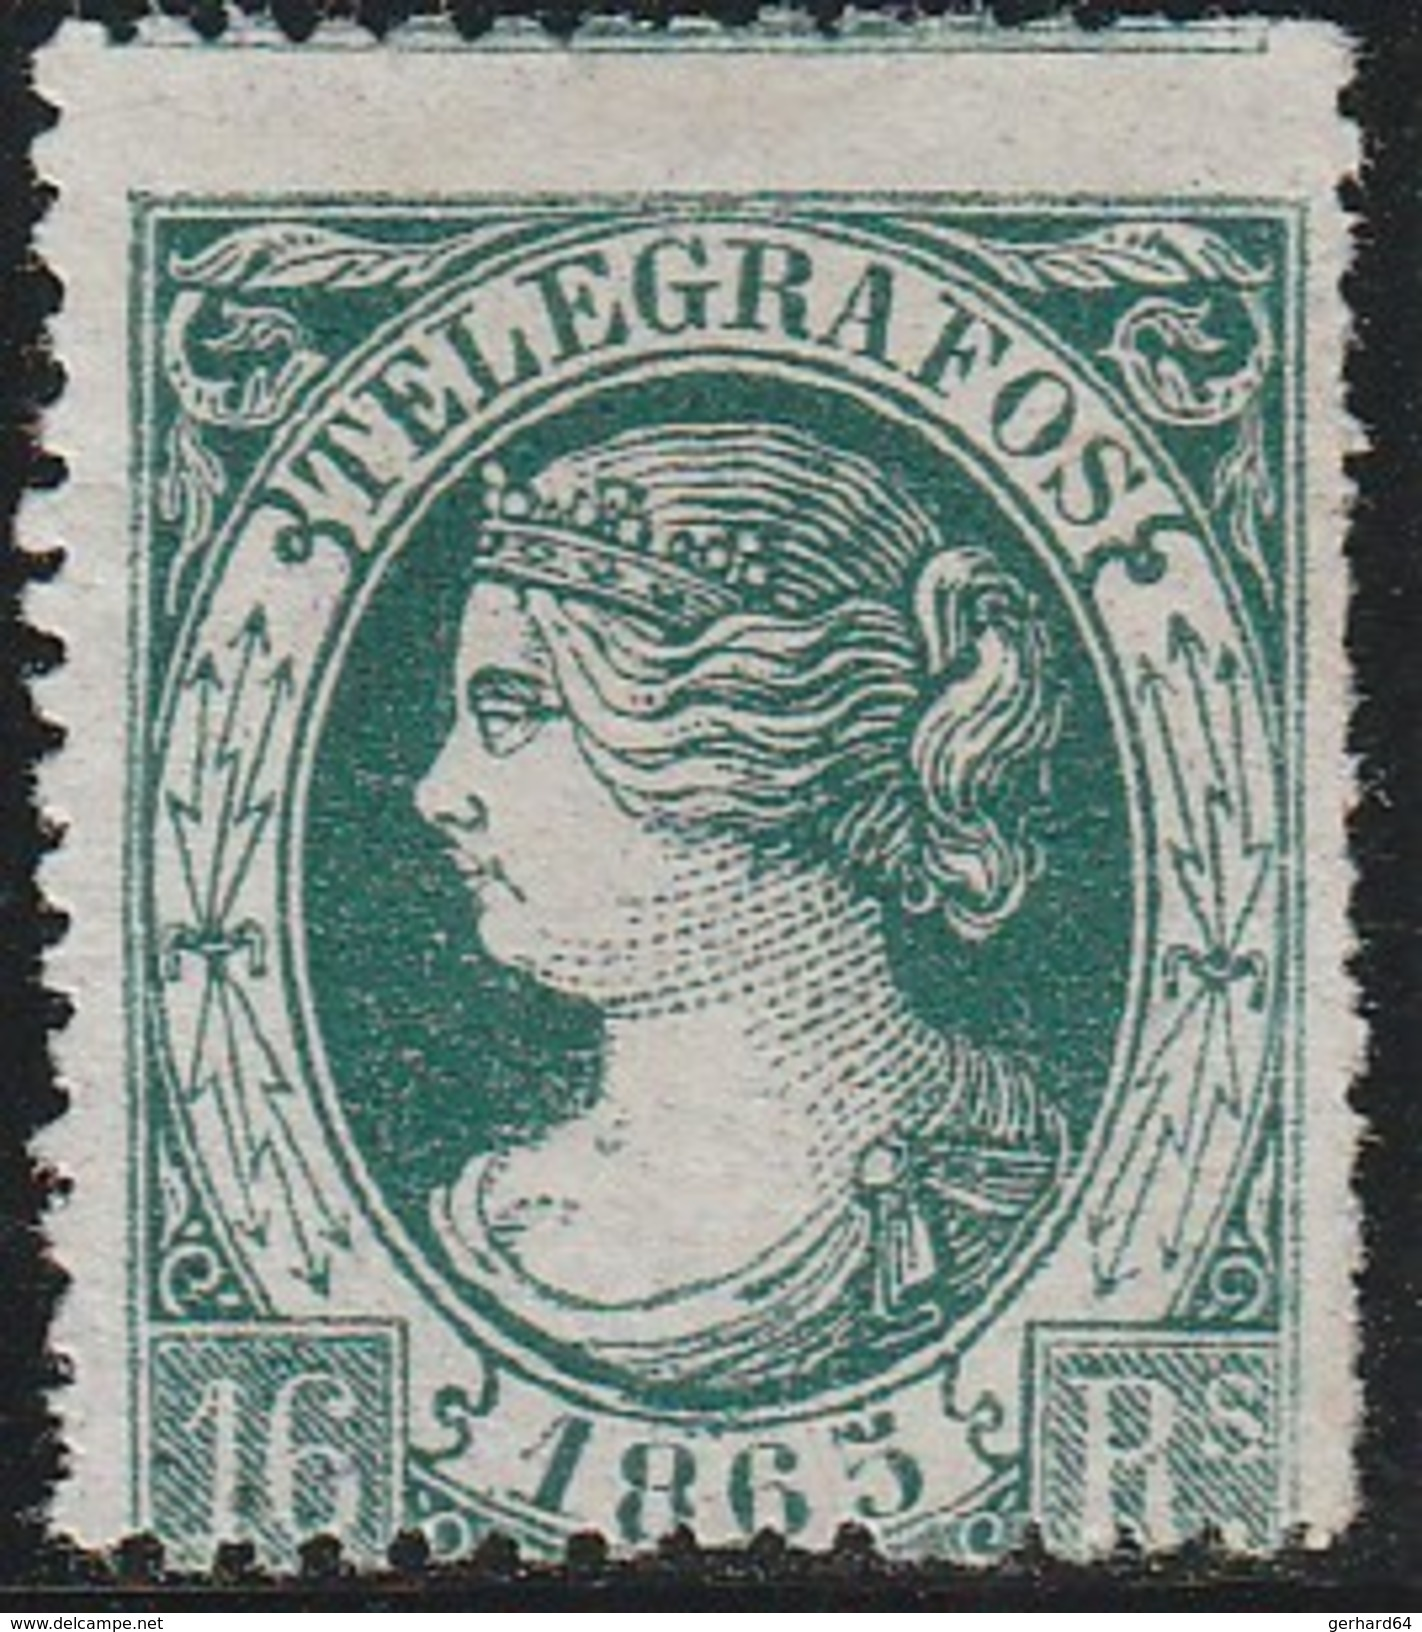 ESPAGNE 1865 - Télégraphe (Telegrafos) N° 11 - Neuf Sans Gomme - Télégraphe